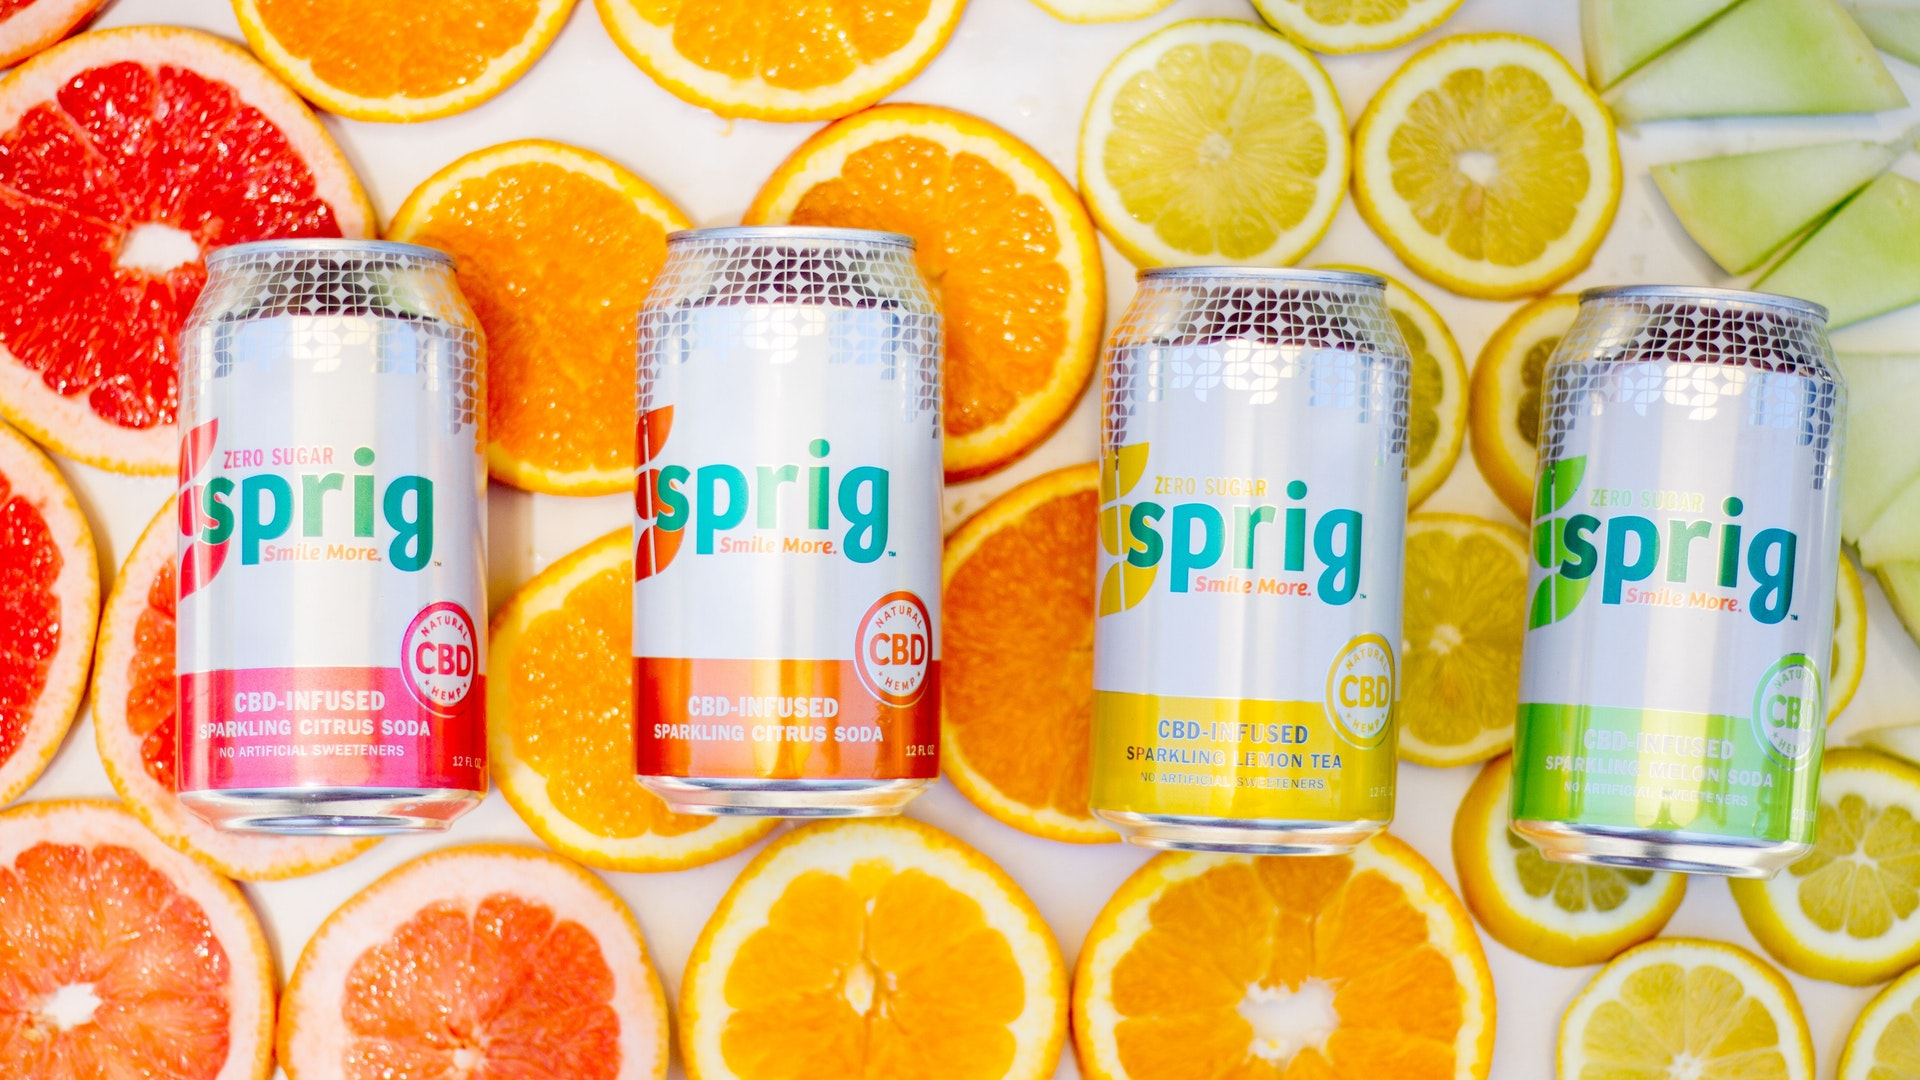 Sprig Sparkling Soda